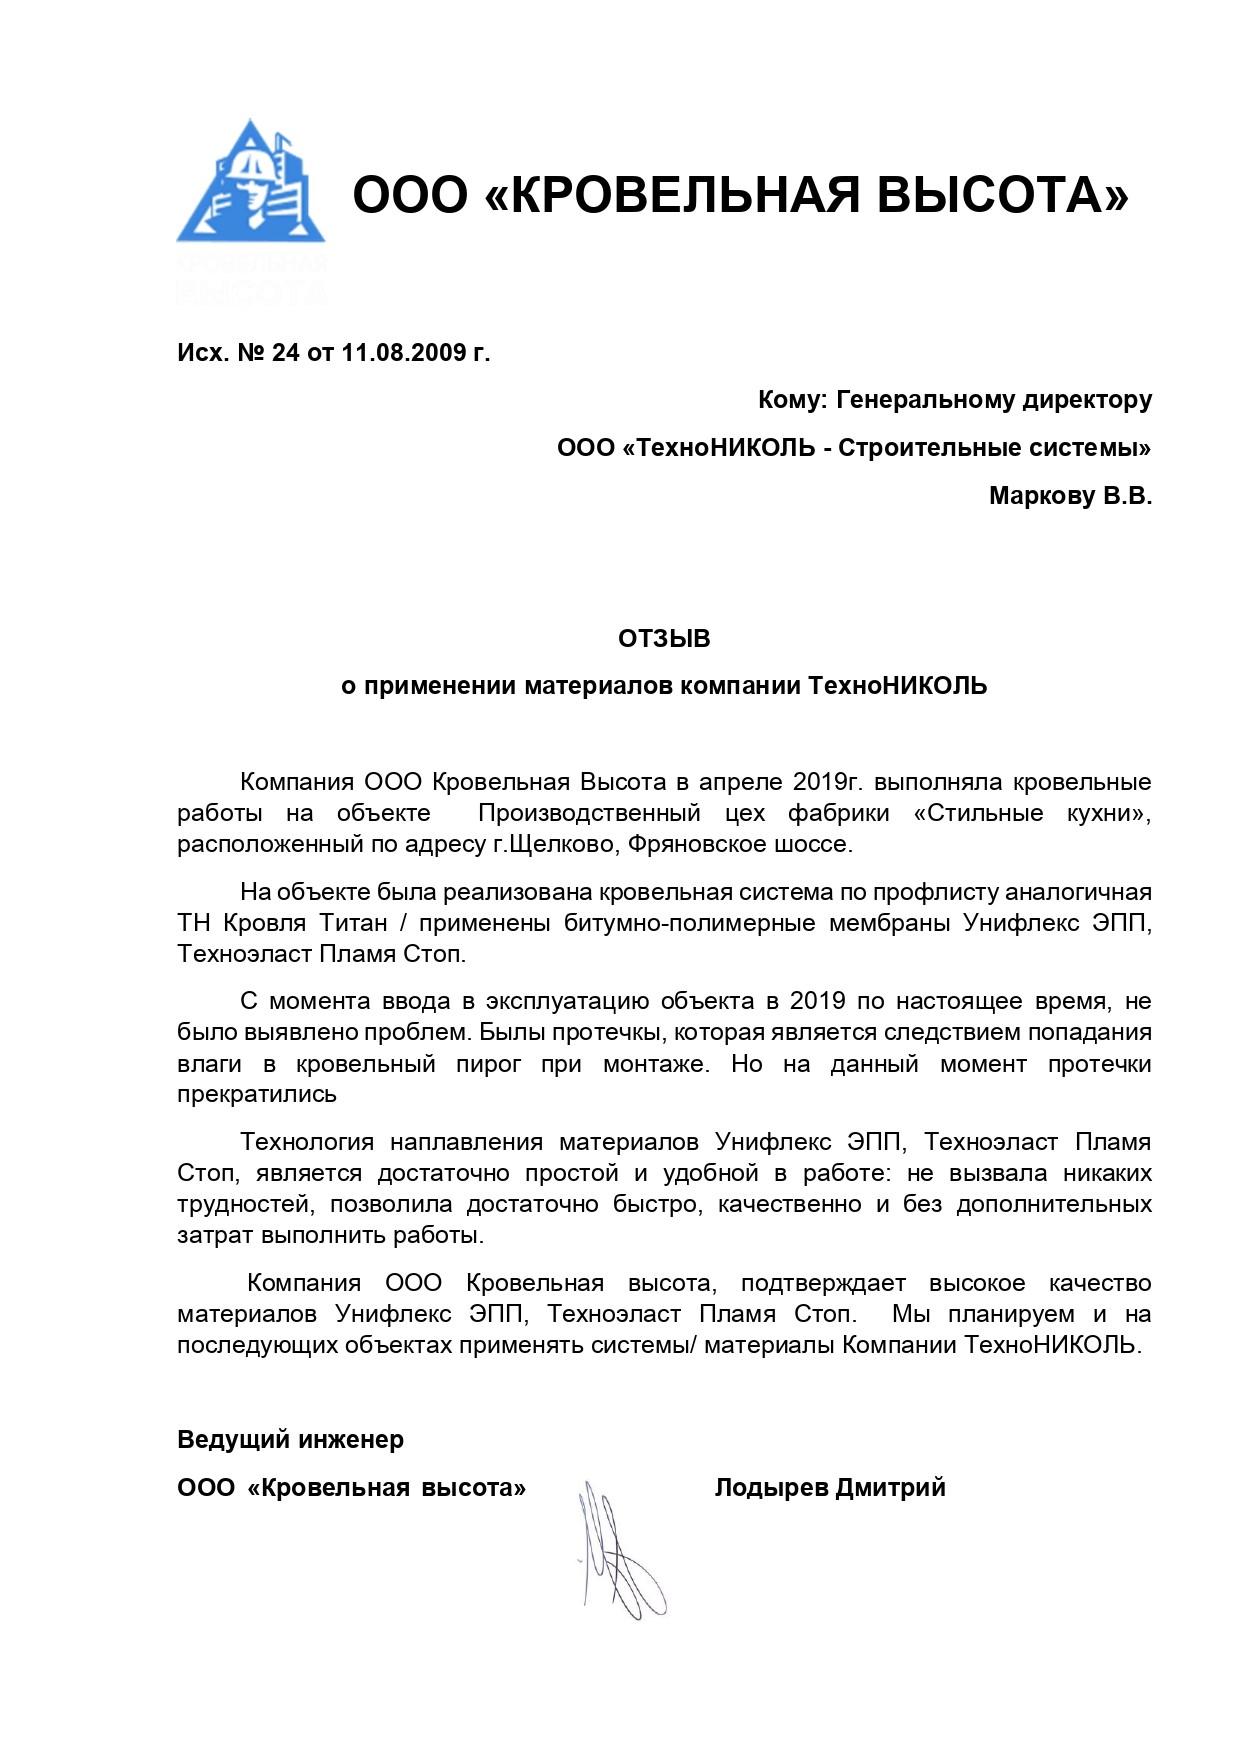 https://shop.tn.ru/media/other_documents/_2019_.__022450.jpg